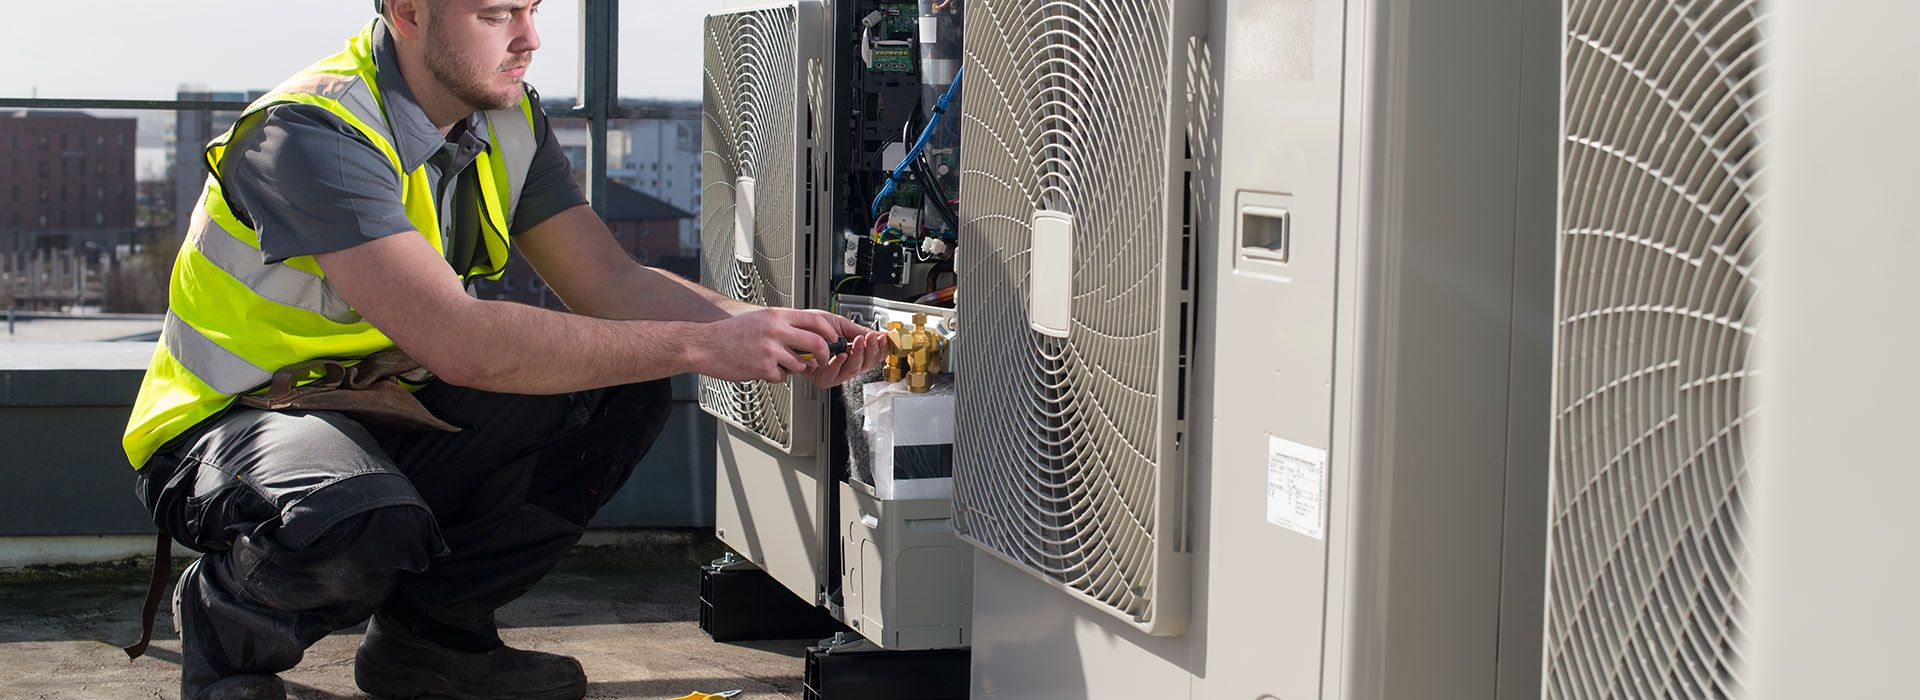 HVAC Repair Virginia Commercial hvac, Appliance repair